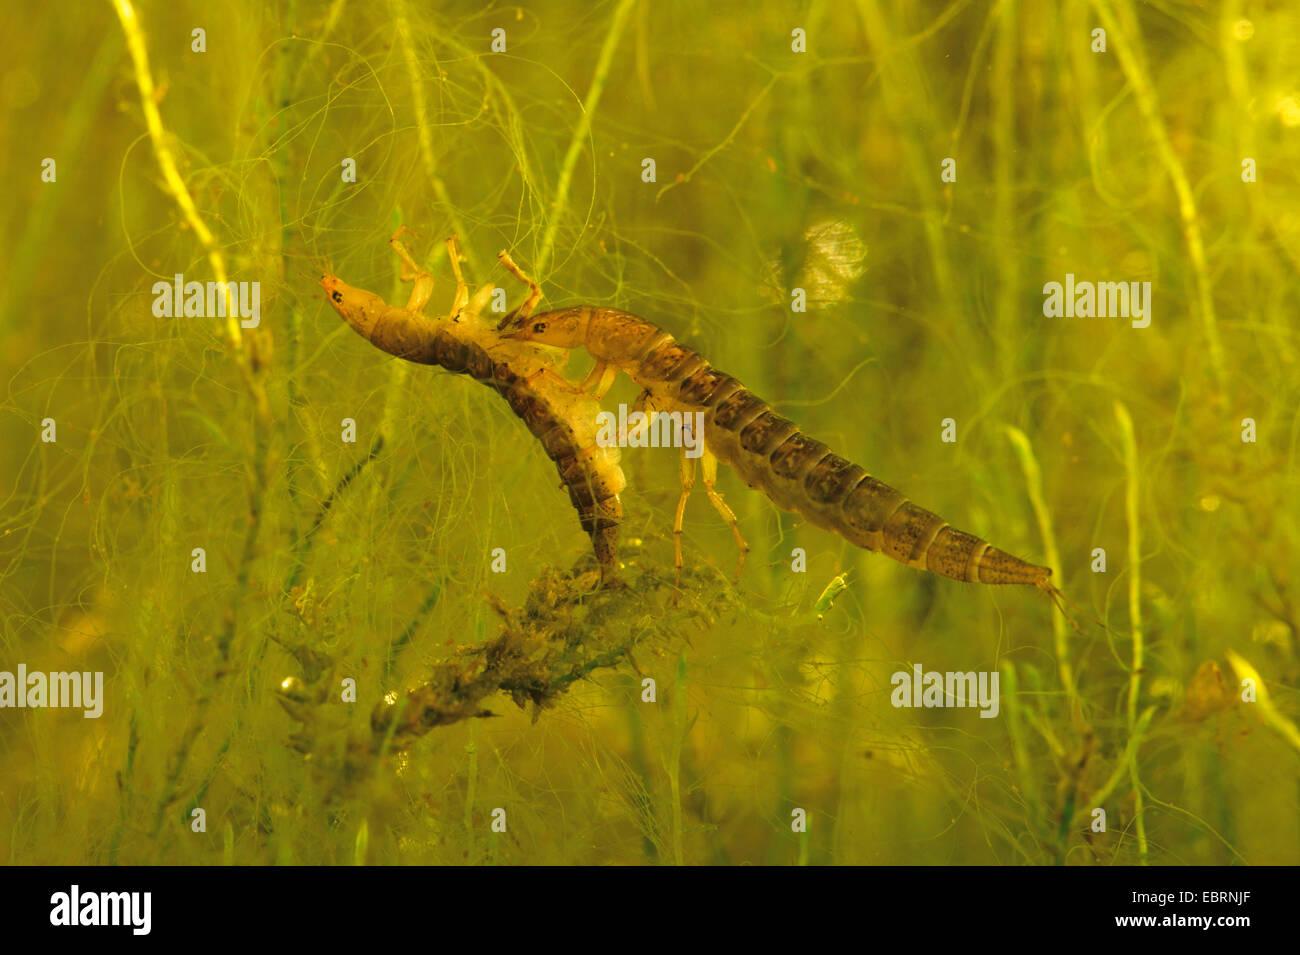 water scavenger beetles, herbivorous water beetles (Hydrophilidae), larva feeds on caught conspecific - Stock Image